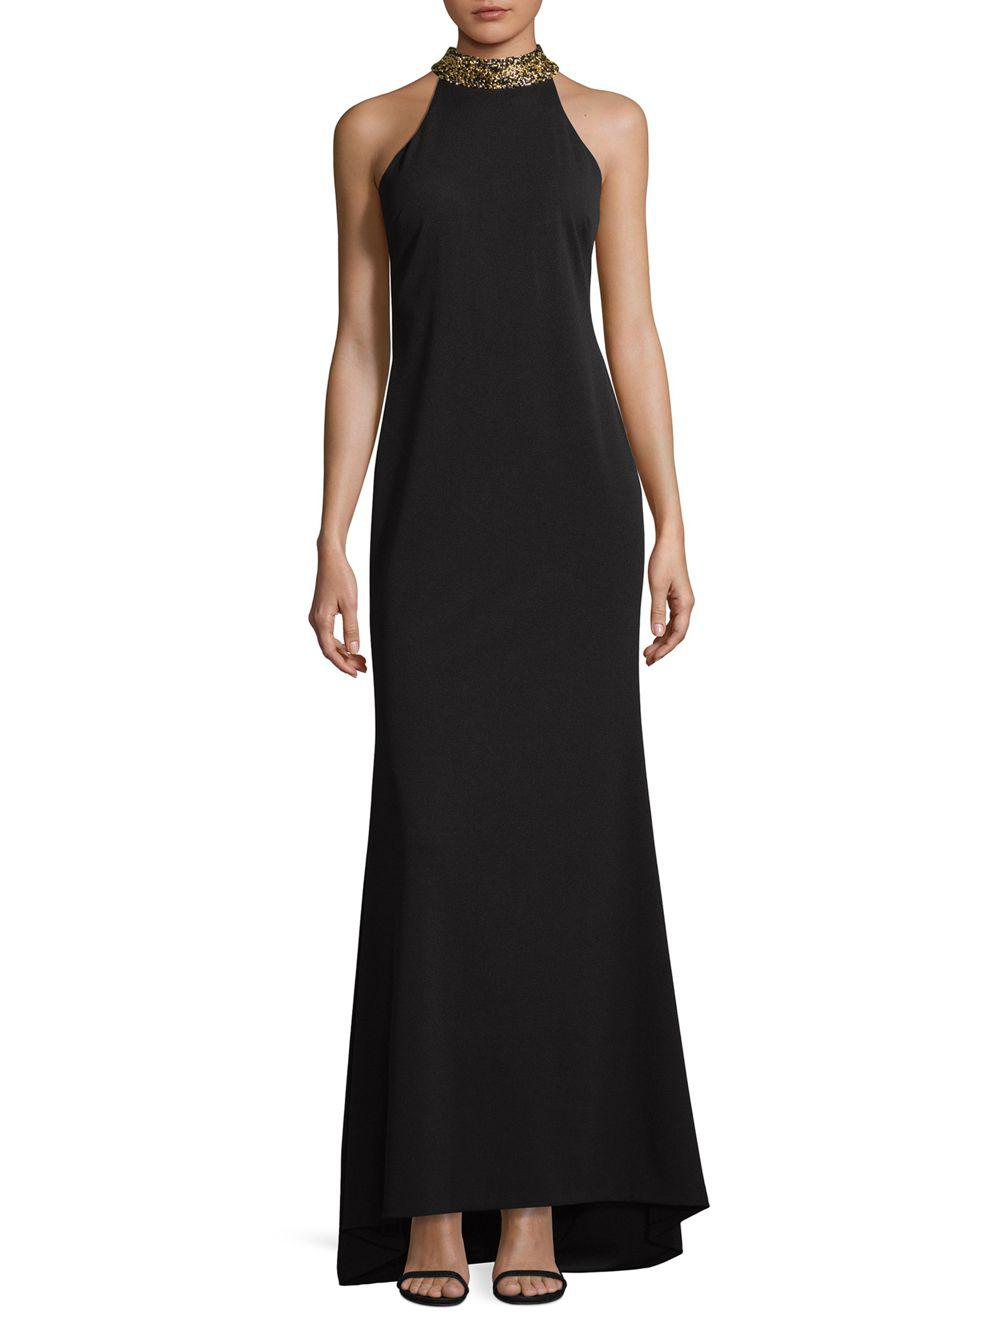 Lyst - Calvin Klein Choker Evening Gown in Black - Save ...